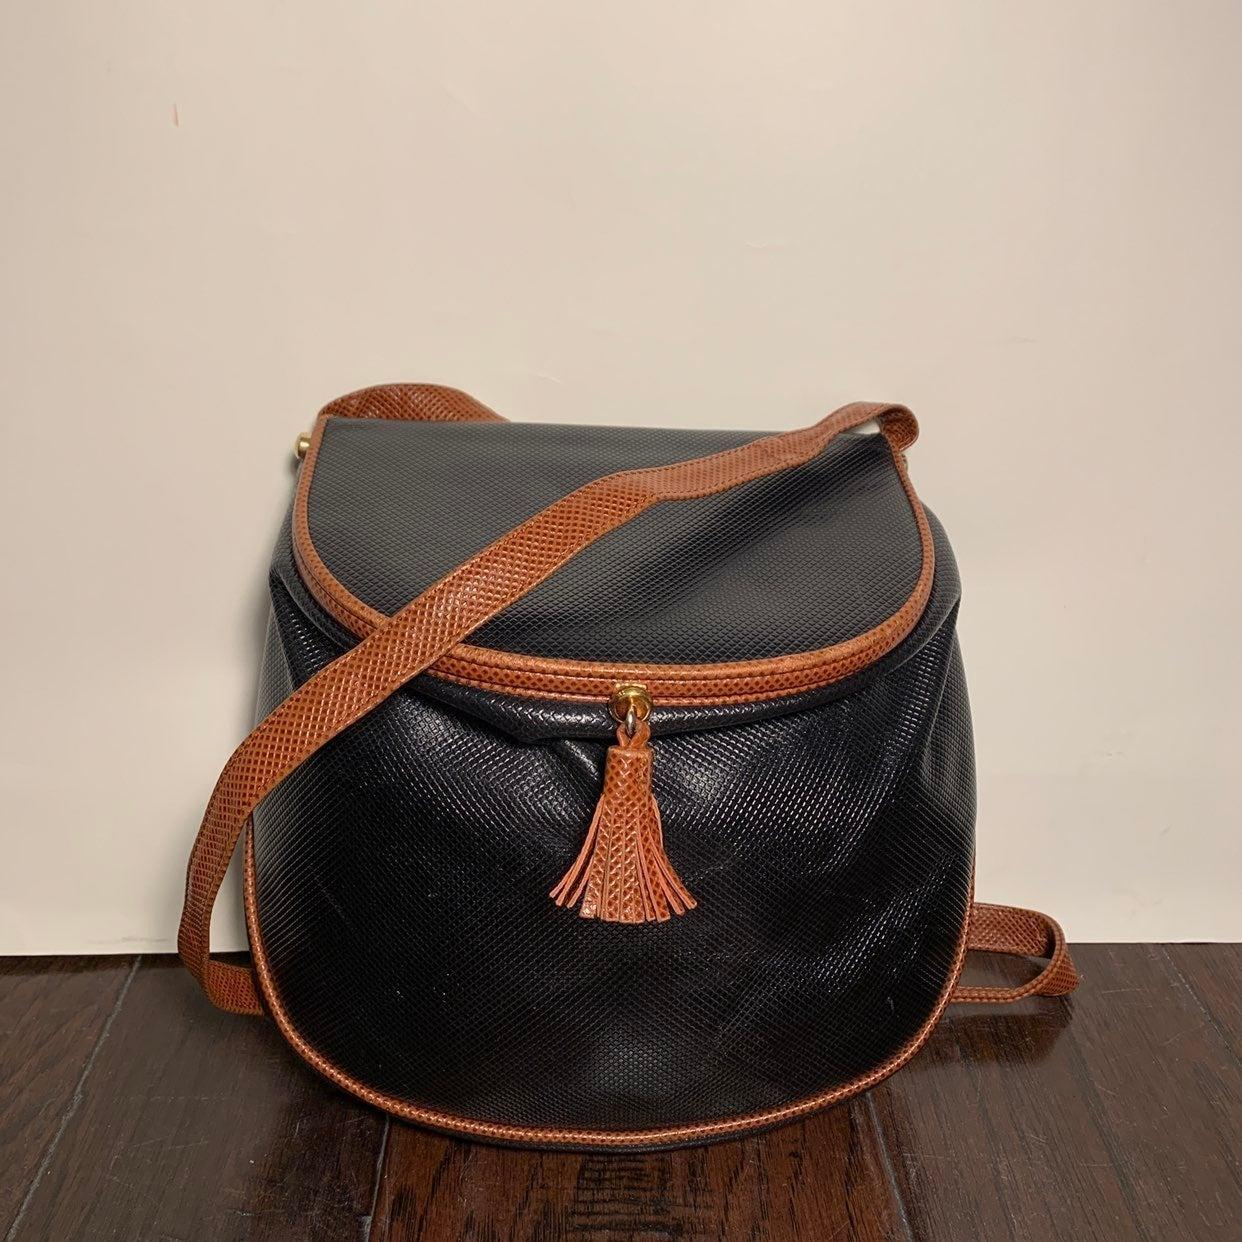 Vtg Bottega Veneta Crossbody Leather Bag